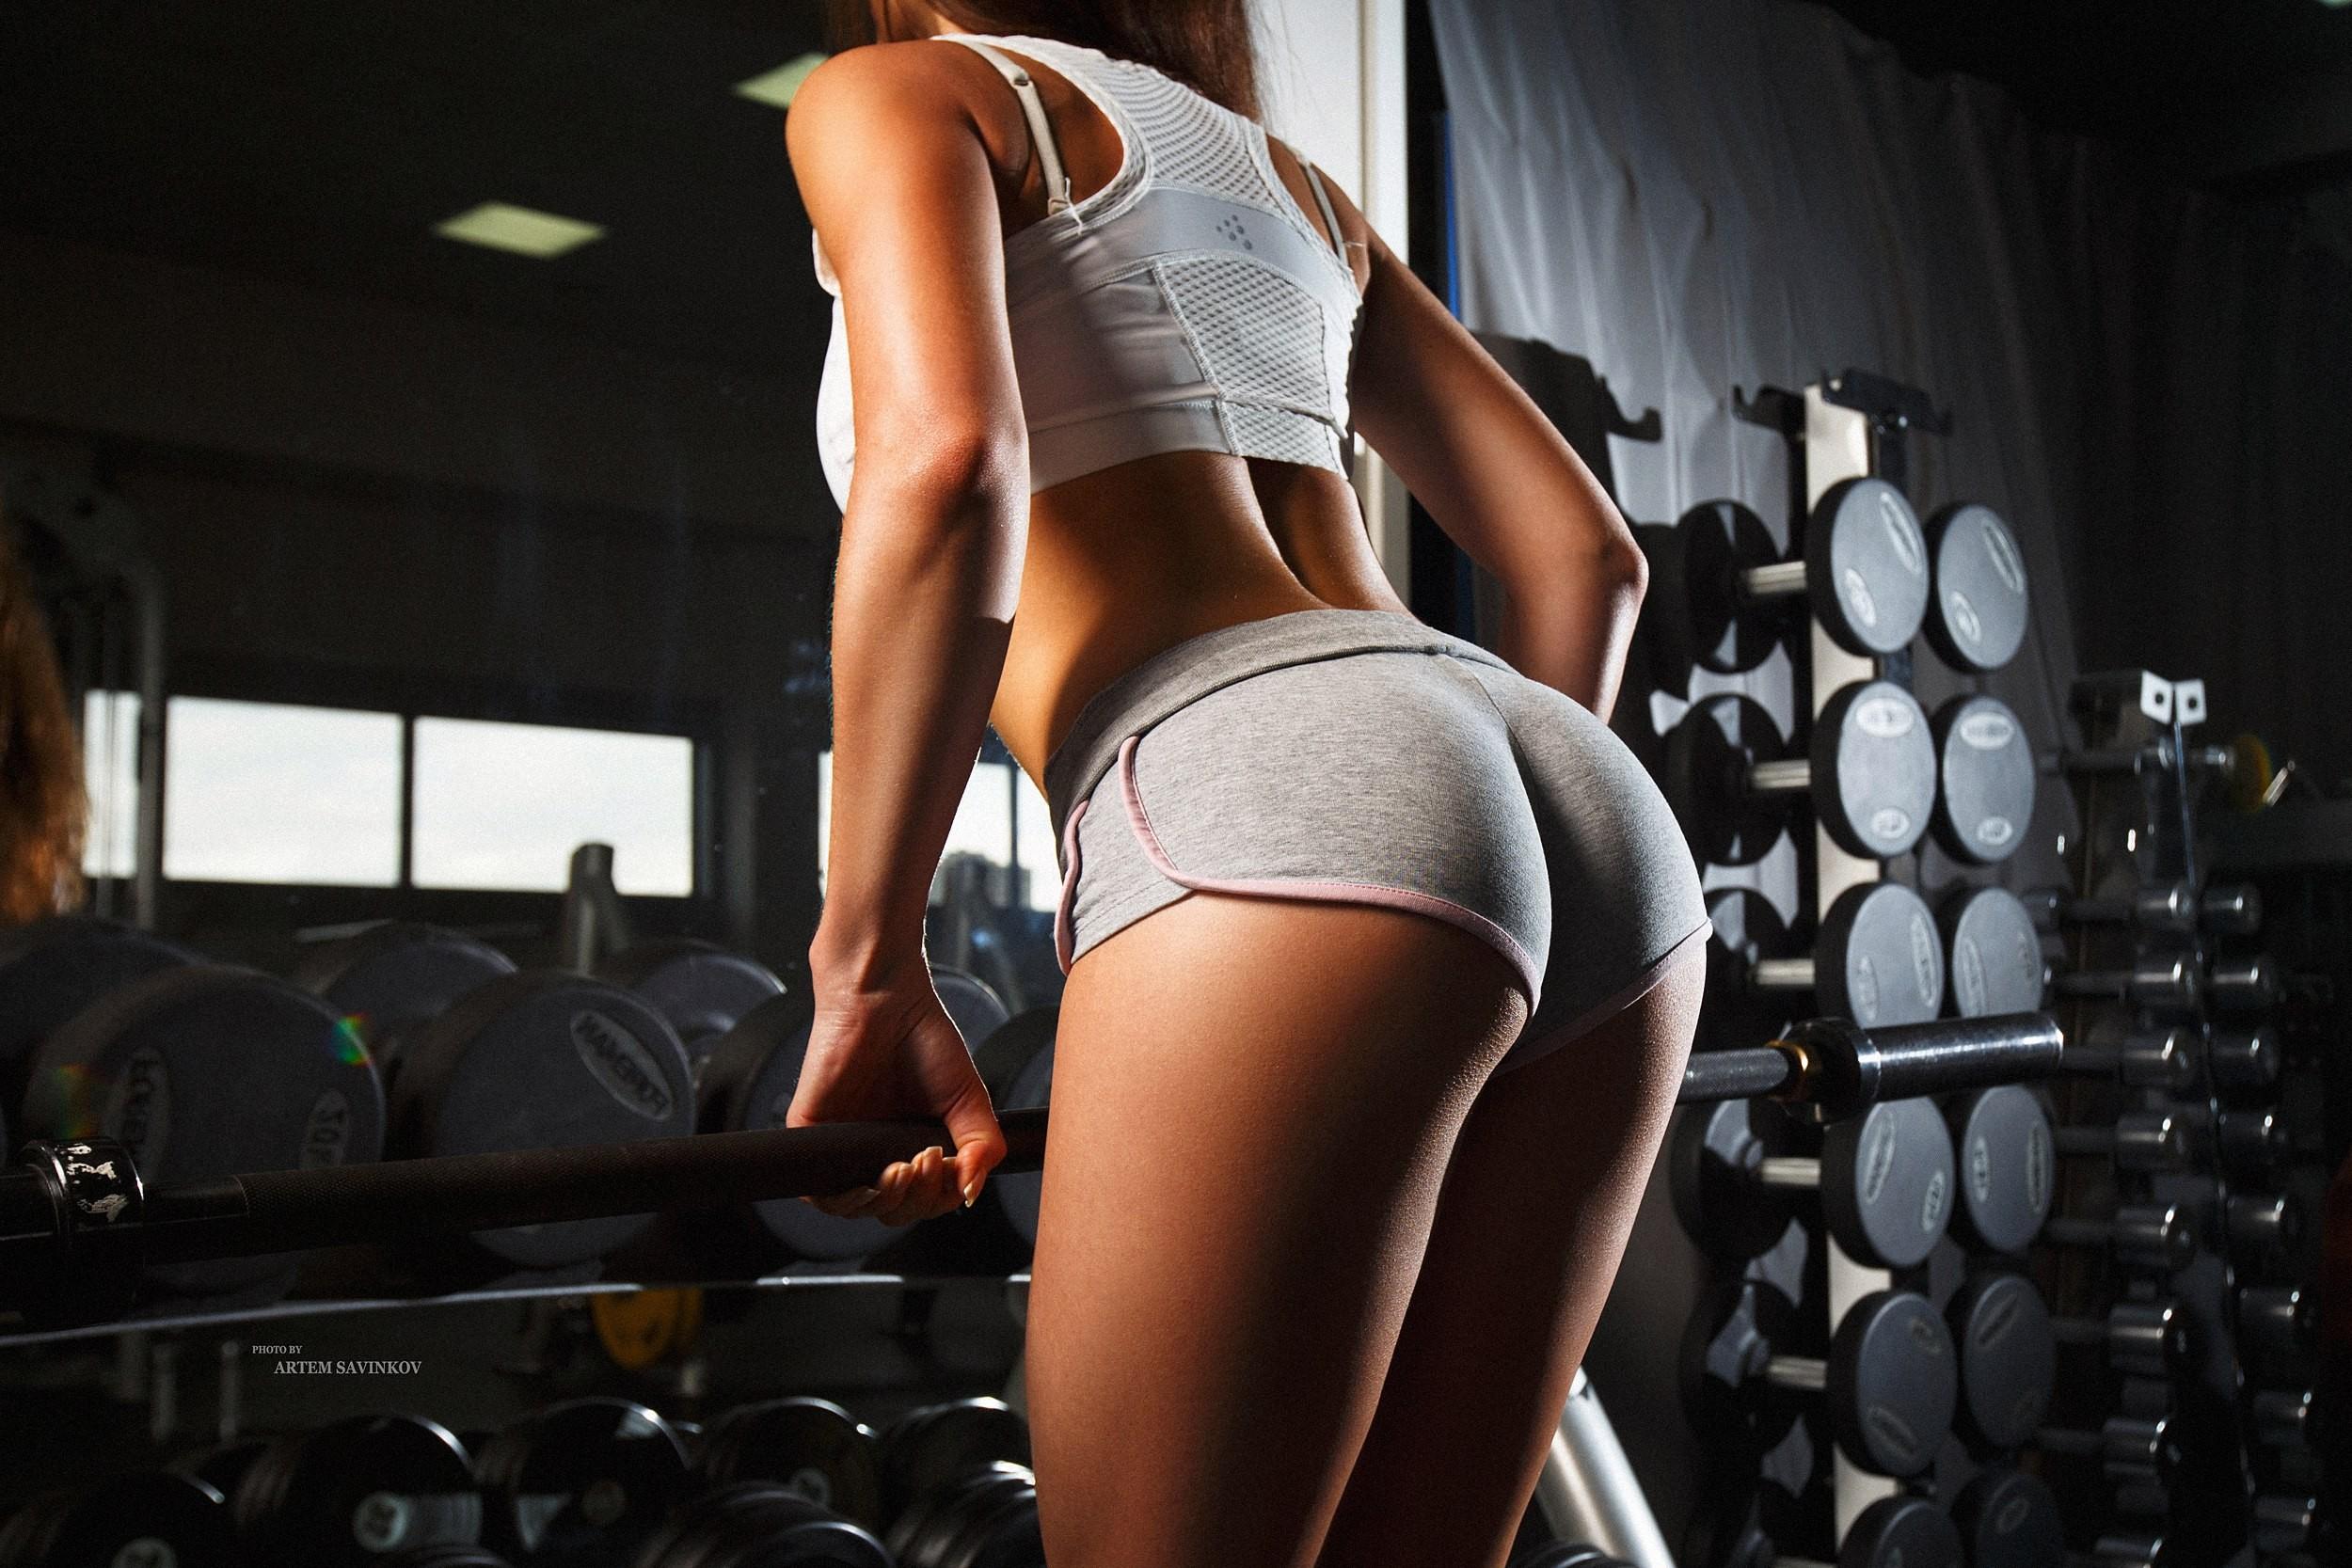 Wallpaper Women Ass Sportswear Room Gyms Mirror